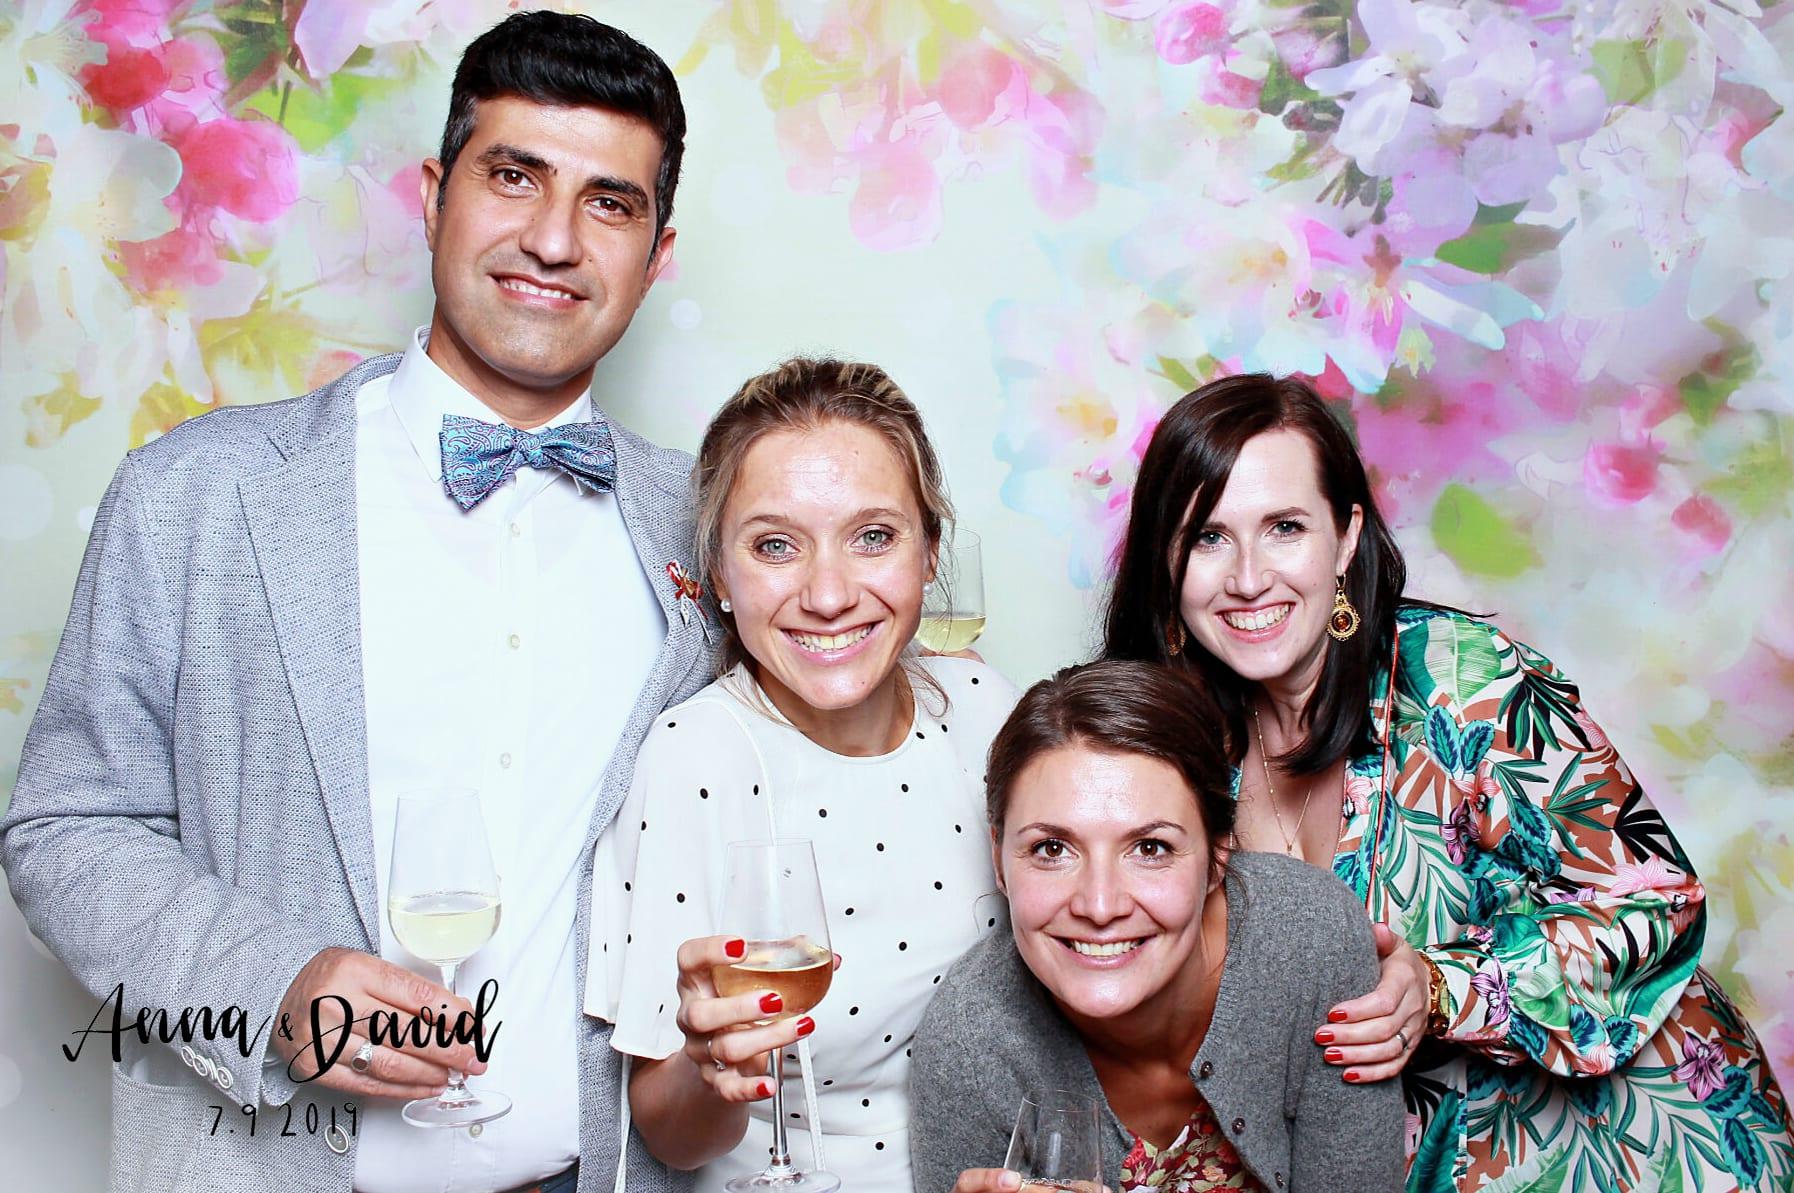 fotokoutek-brno-svatba-ad-7-9-2019-648710